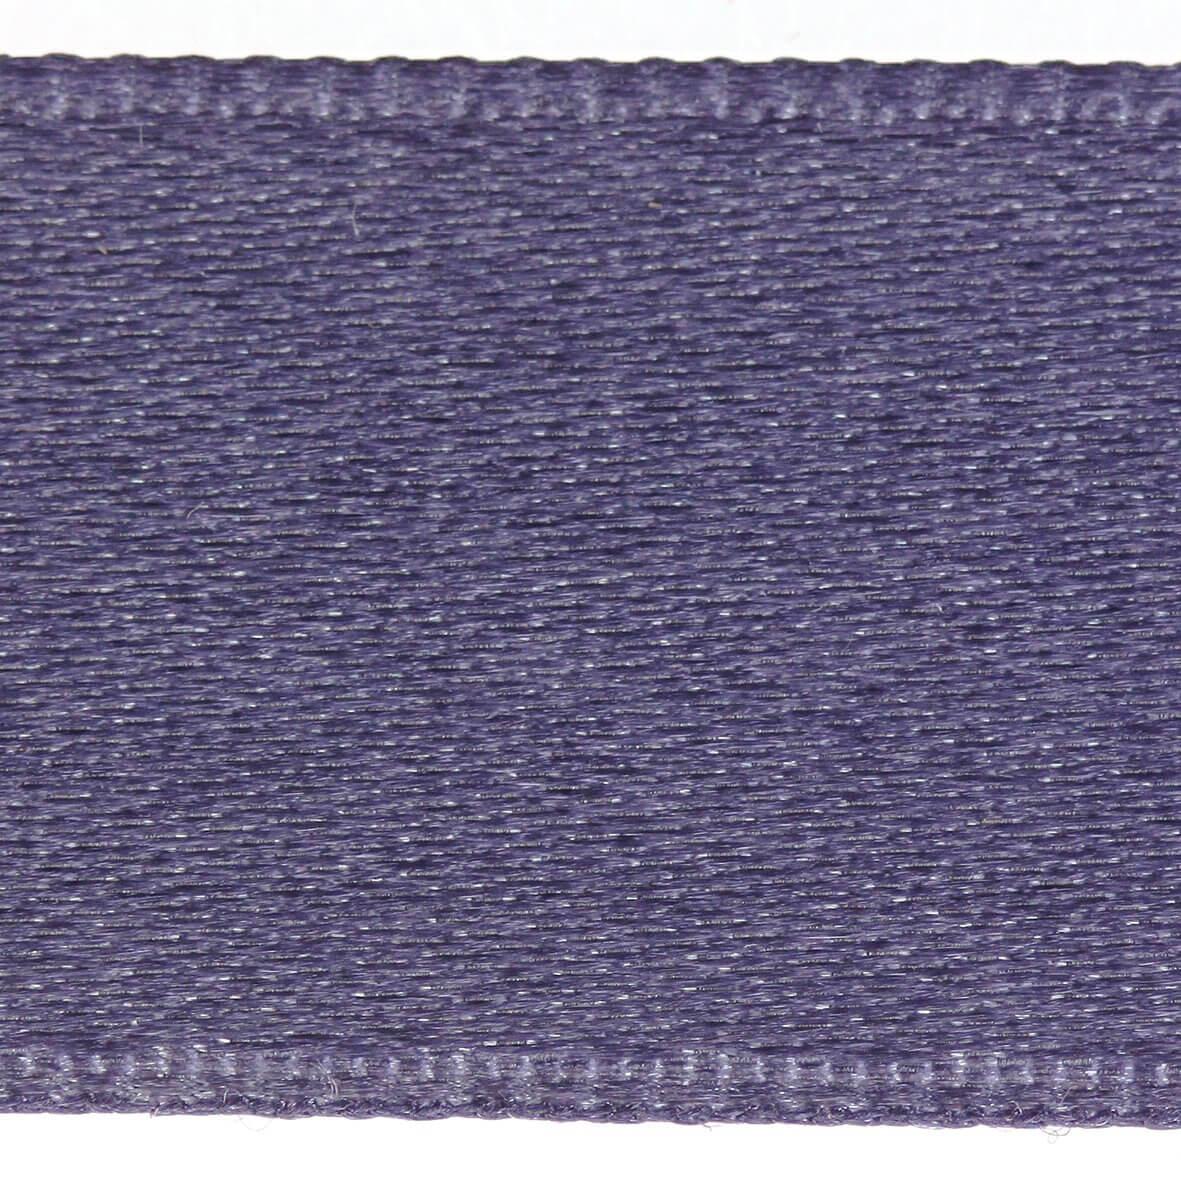 Slate Blue Col. 297 - 6mm Satab Satin Ribbon